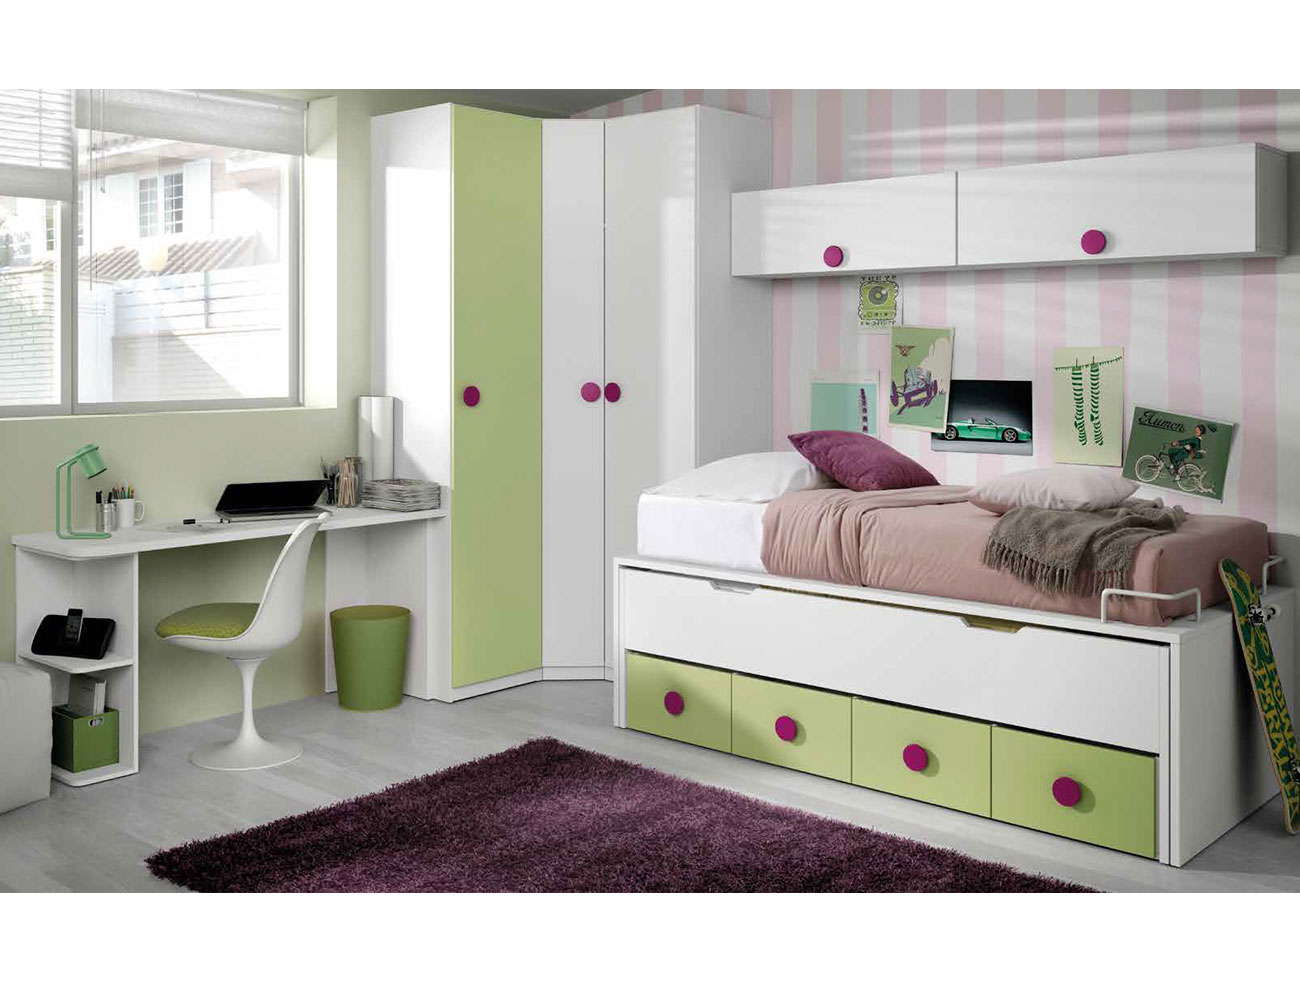 11 dormitorio juvenil cama tatamic 4 cajones